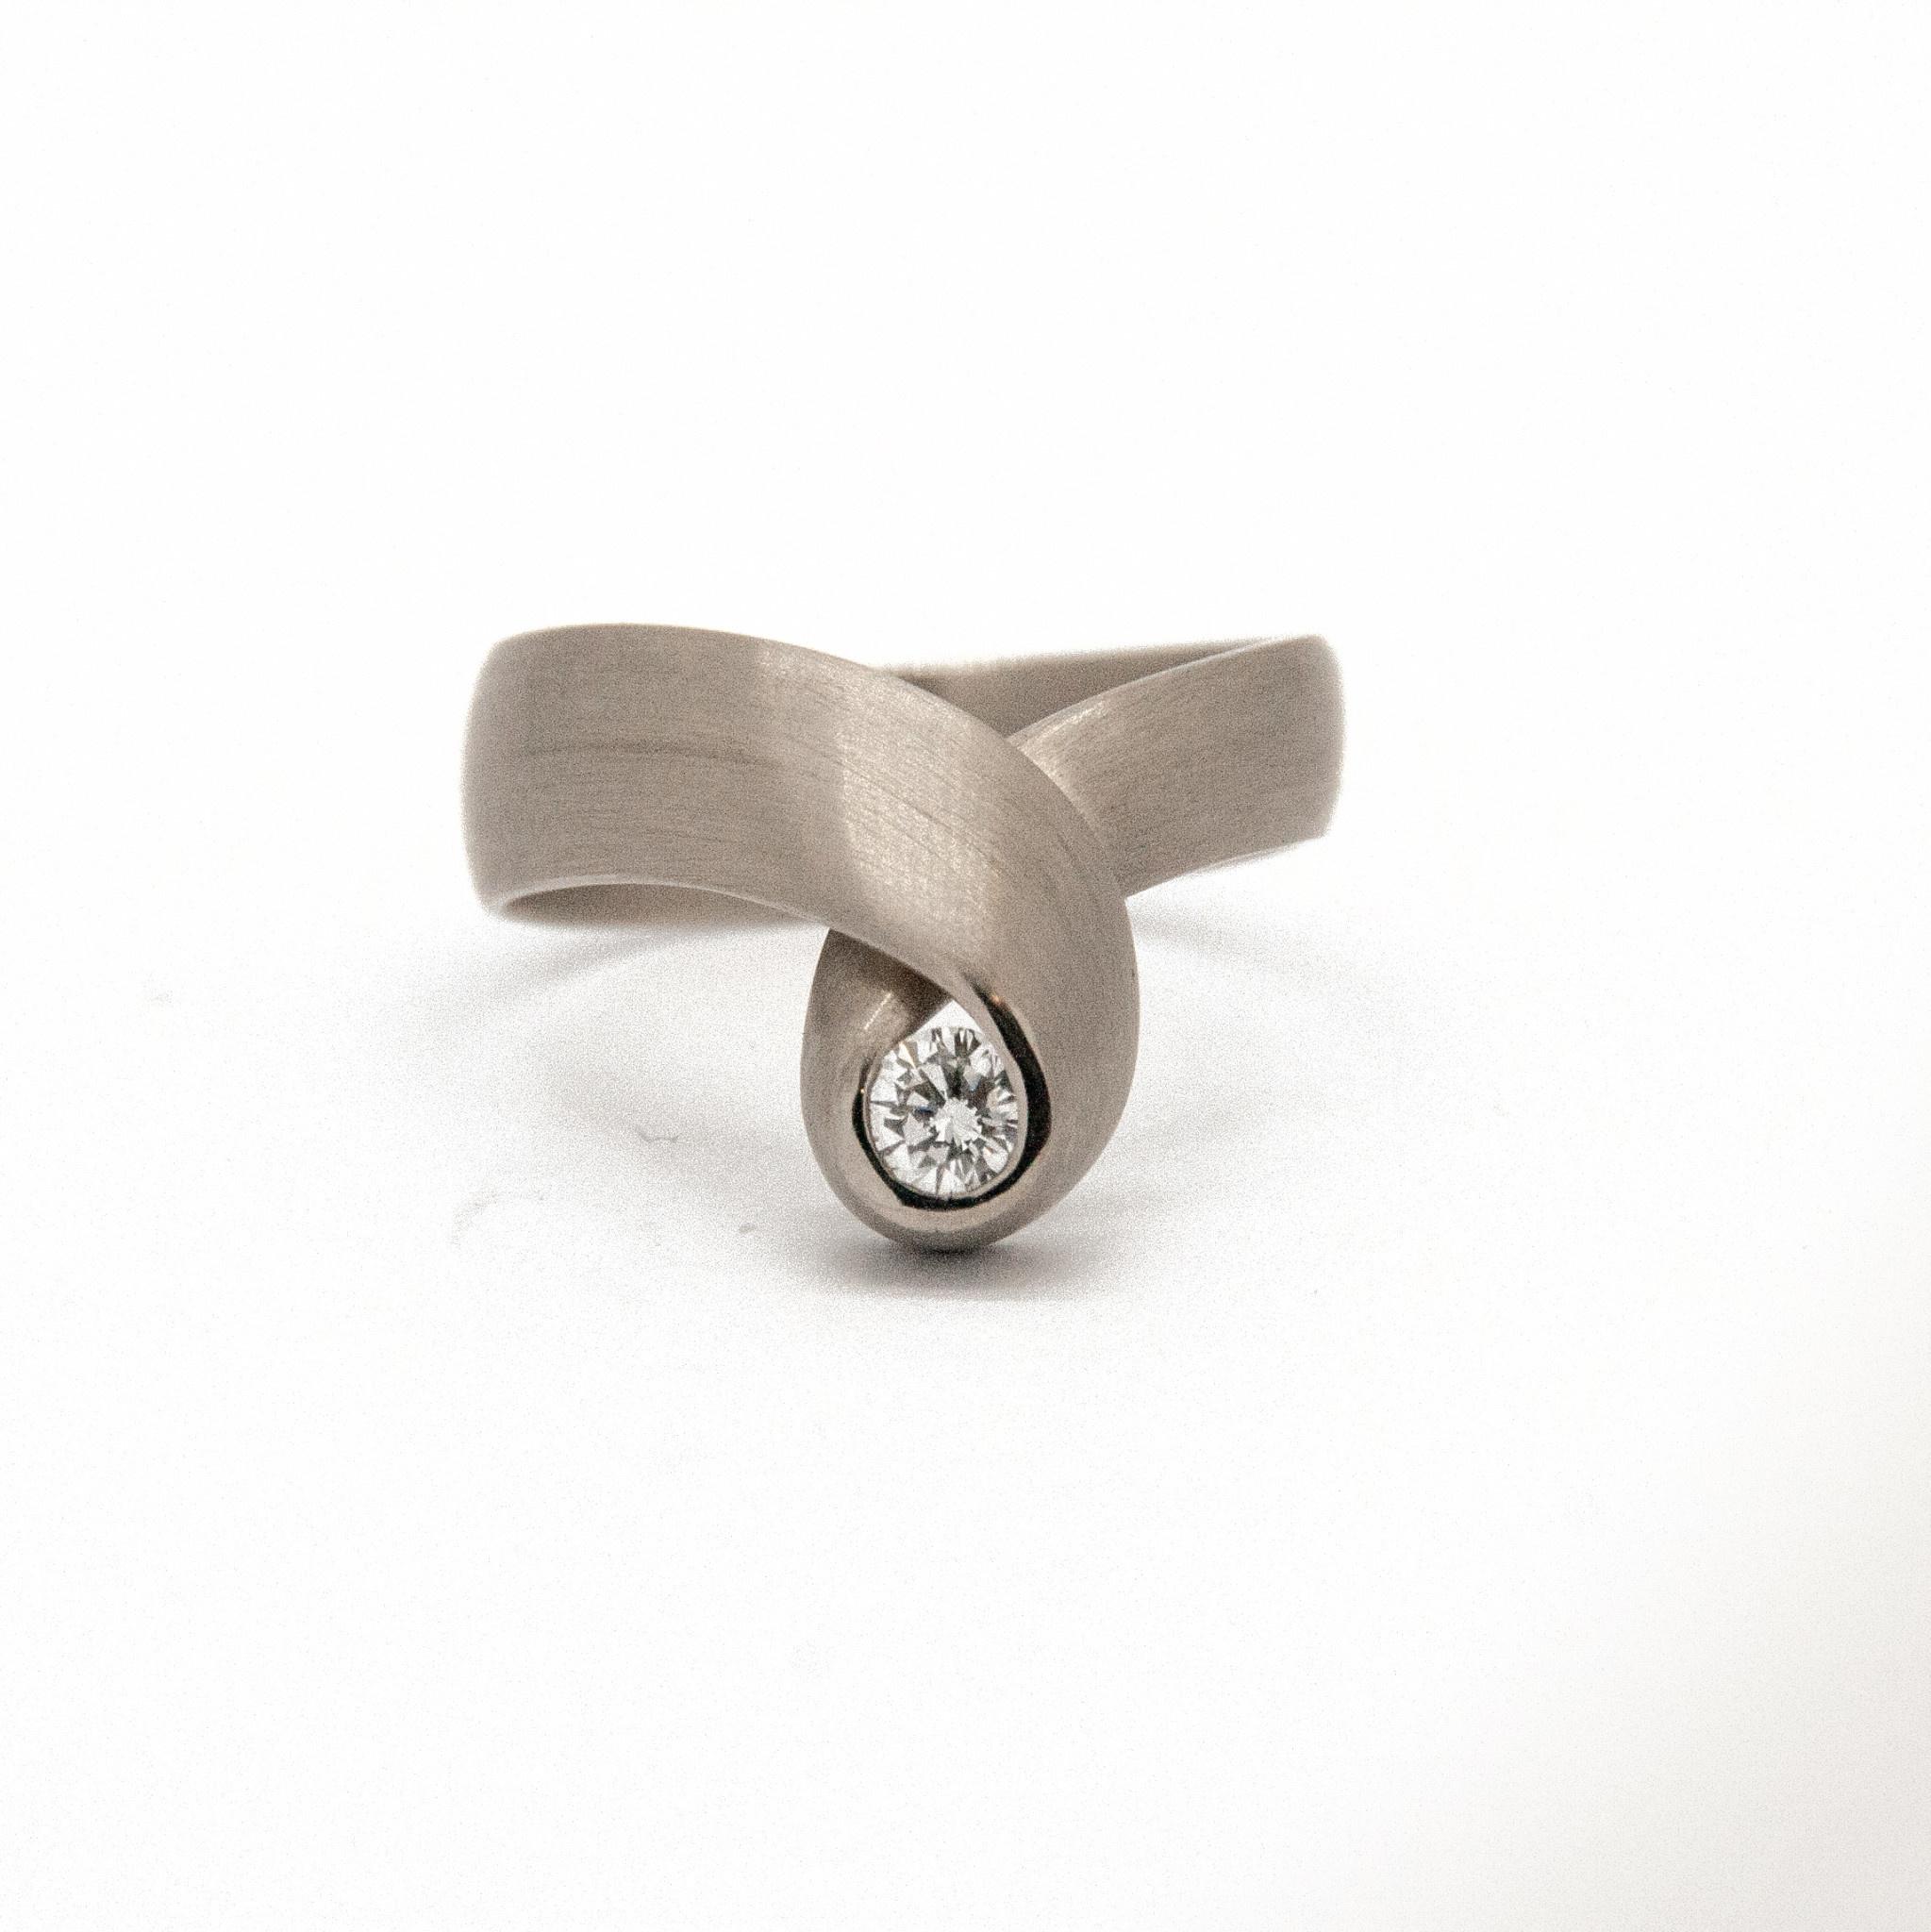 14k white gold ring size 56-5